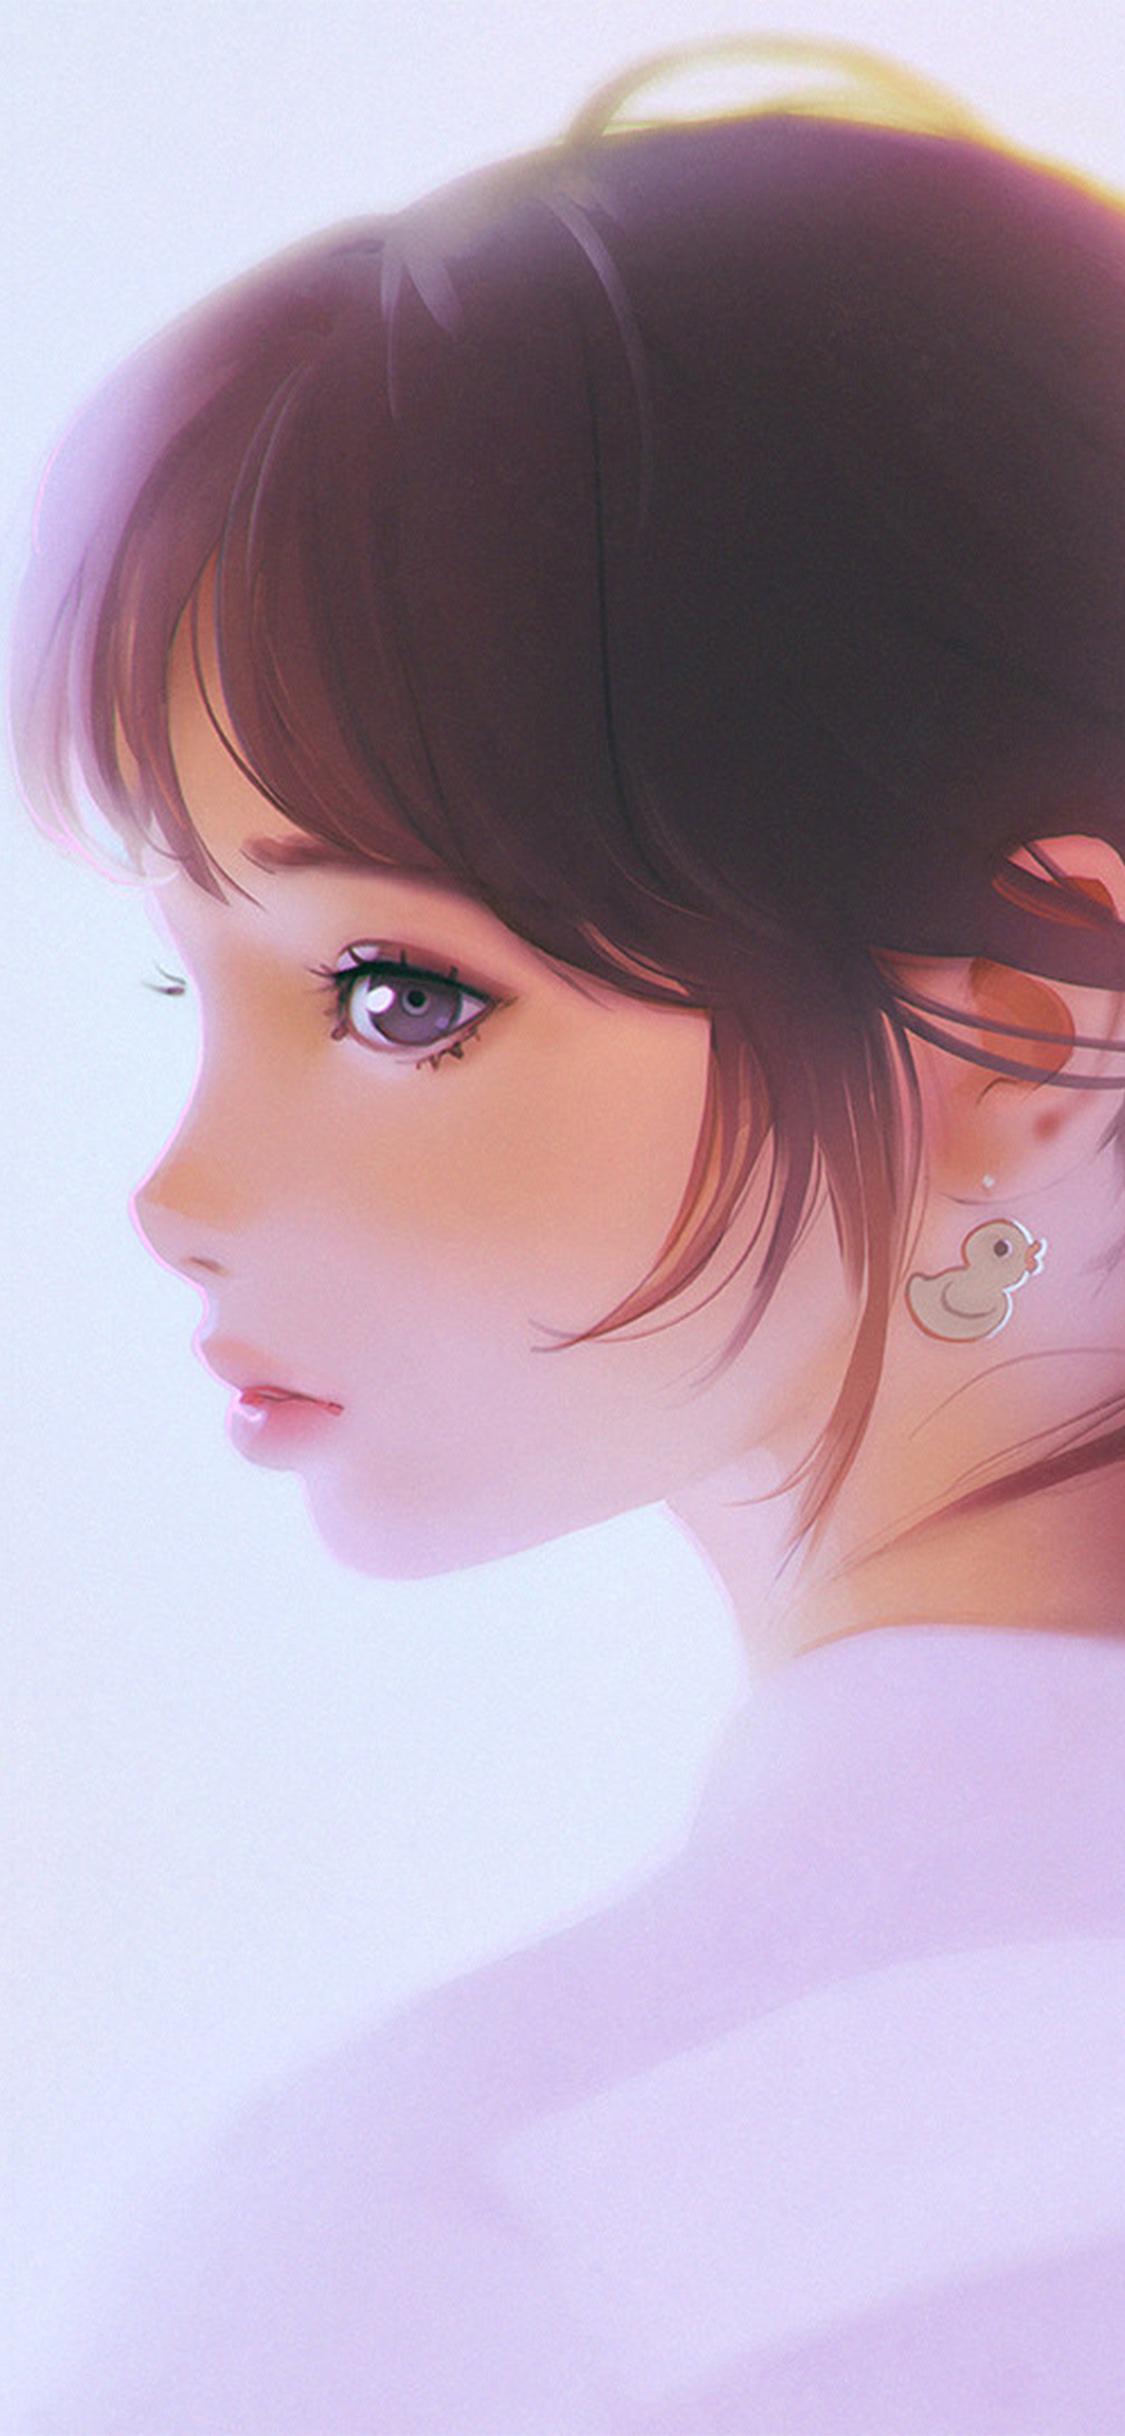 iPhoneXpapers.com-Apple-iPhone-wallpaper-av41-girl-face-cute-ilya-kuvshinov-illustration-art